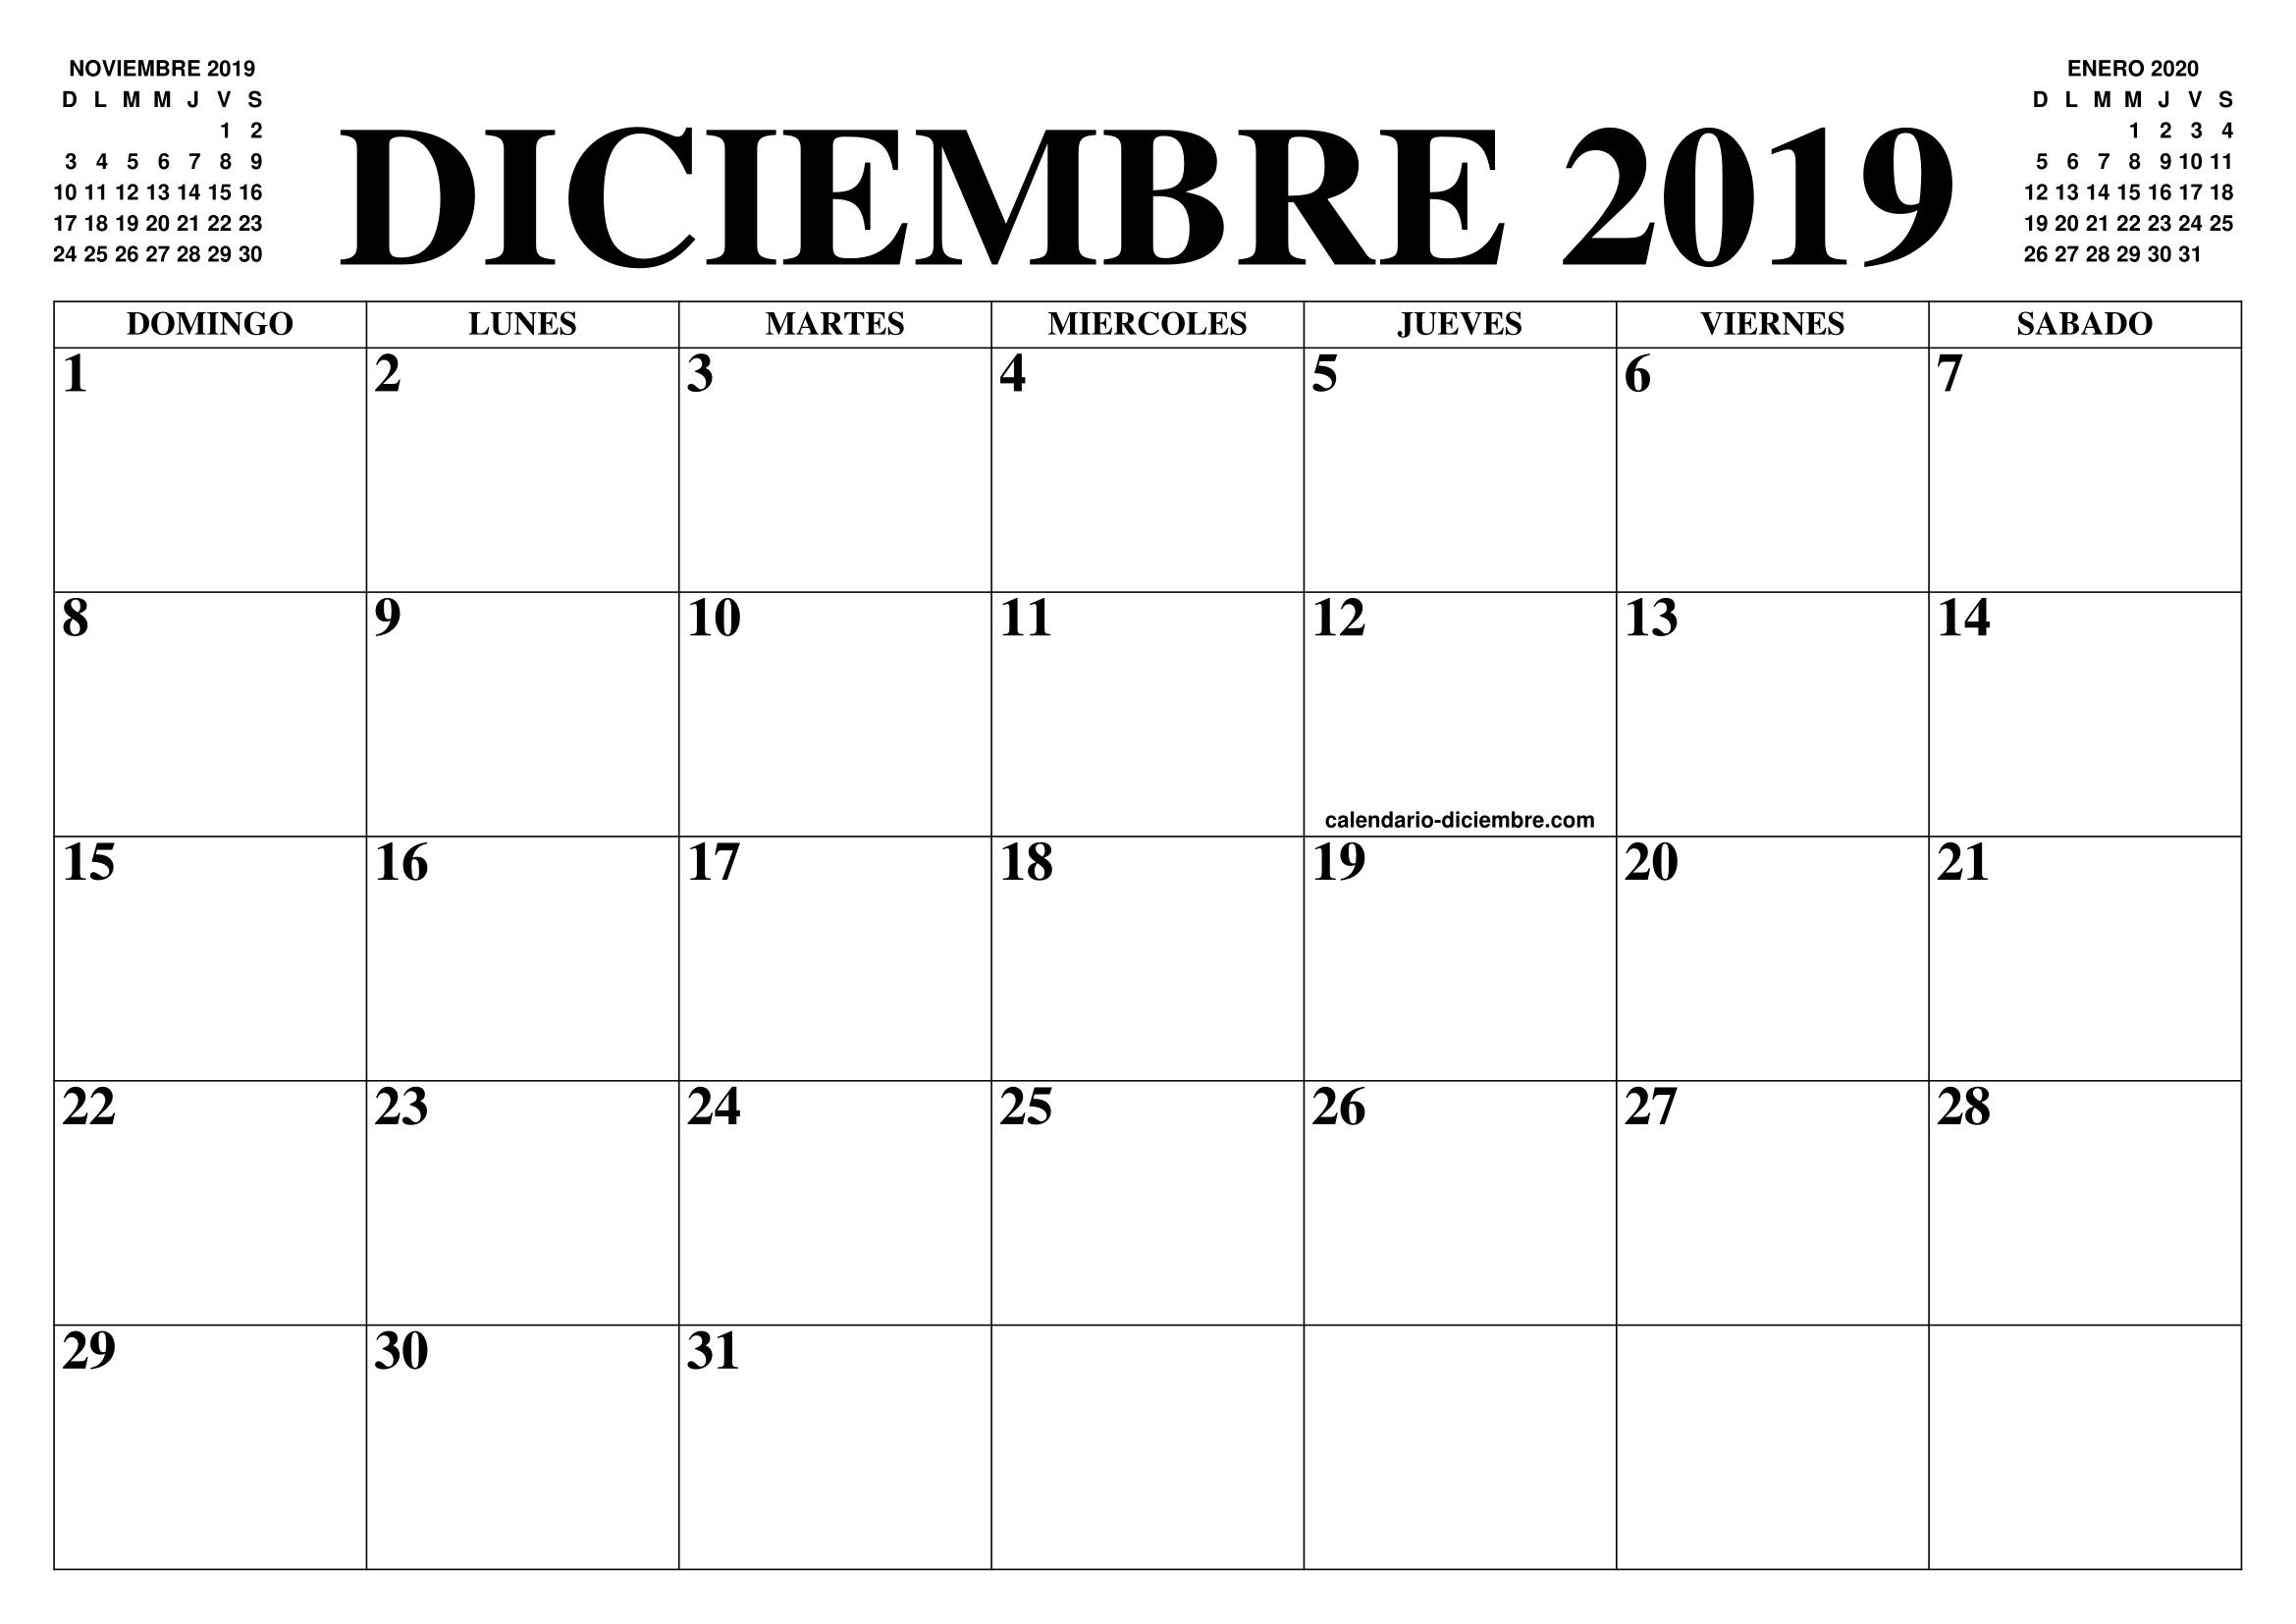 Calendario Diciembre.Calendario Diciembre 2019 2020 El Calendario Diciembre